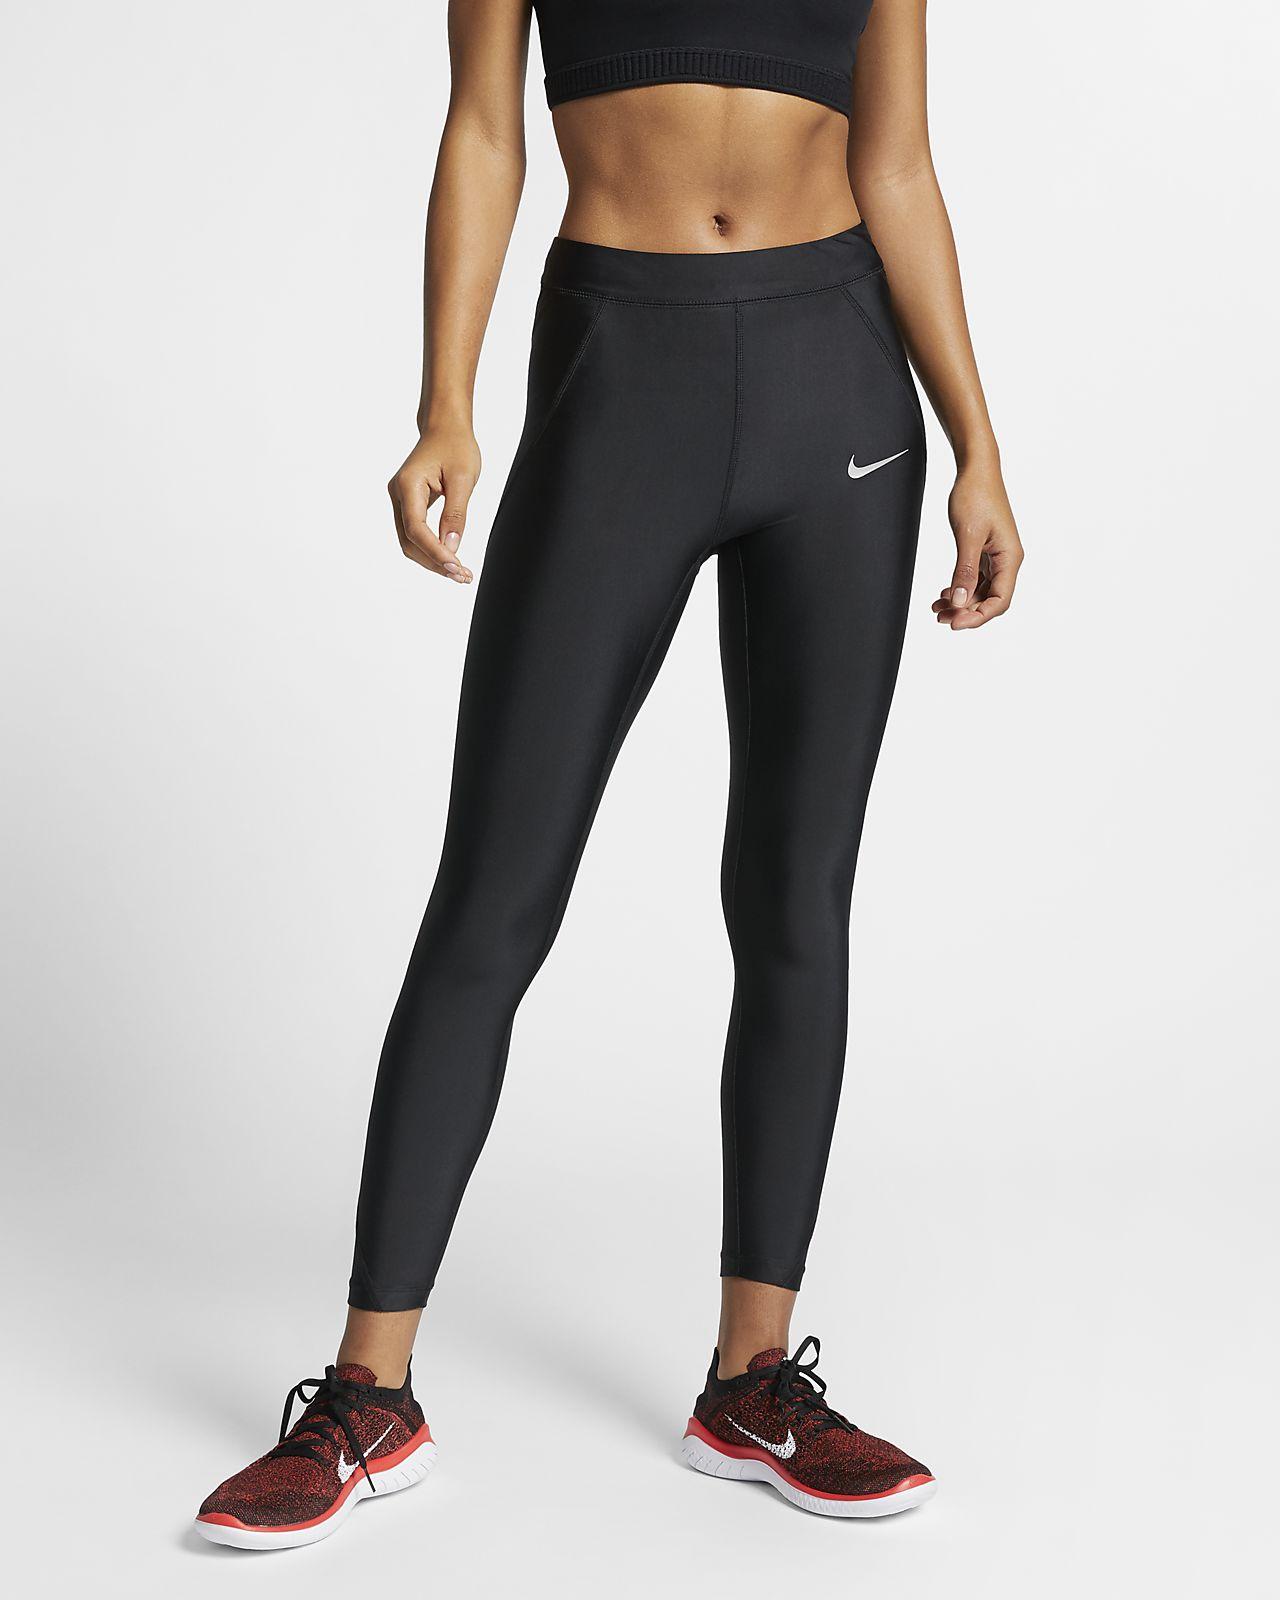 70753bca538 Nike Speed Women s Mid-Rise 7 8 Running Tights. Nike.com LU